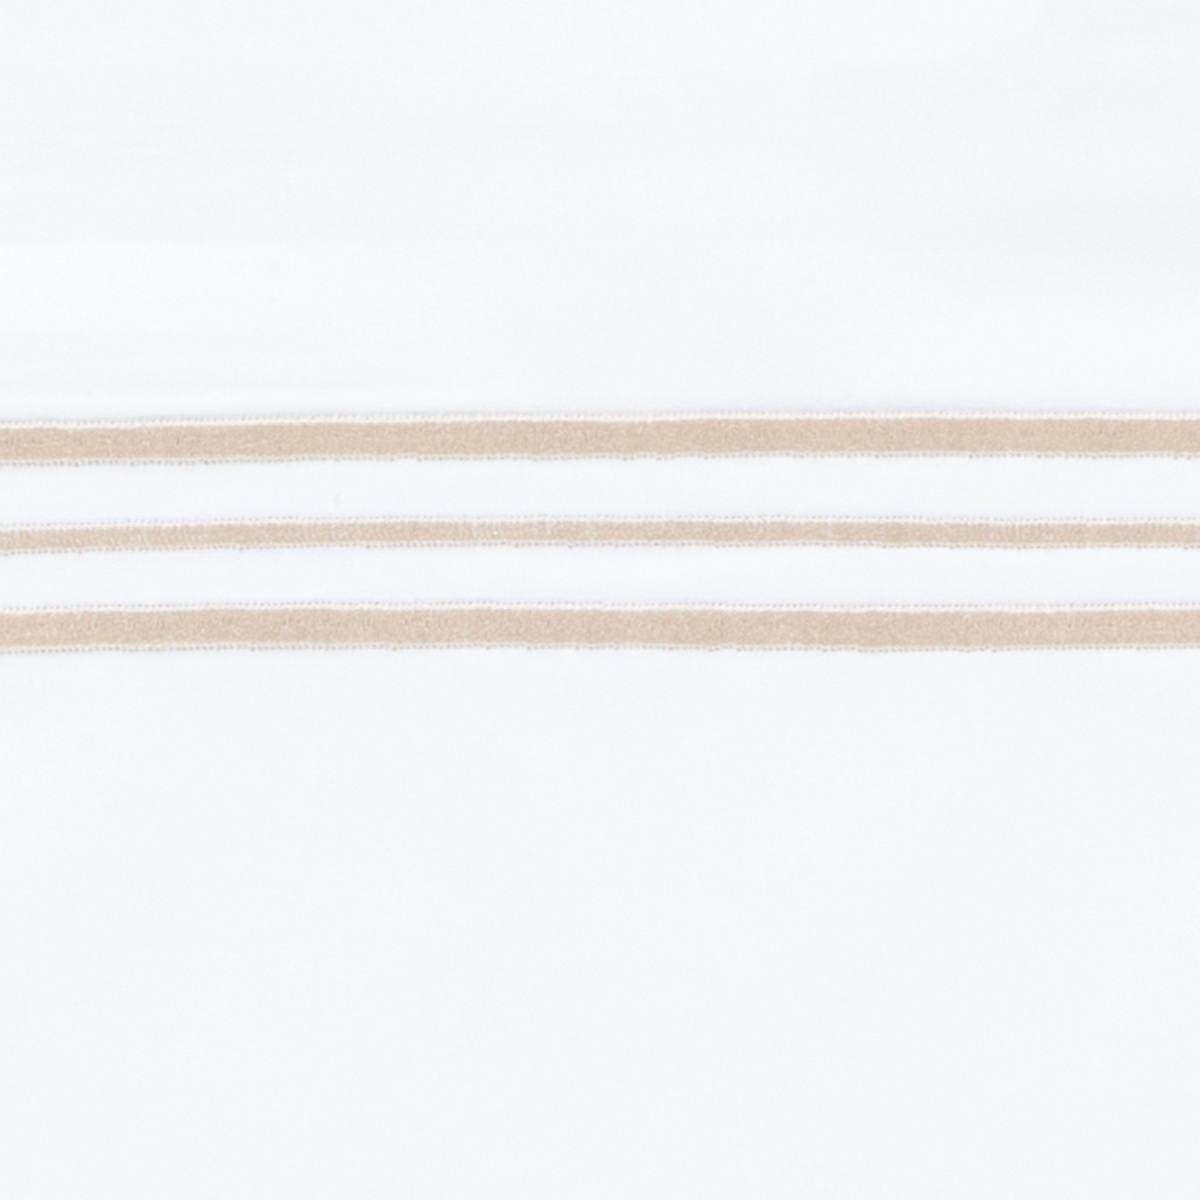 Trio Linen Swatch